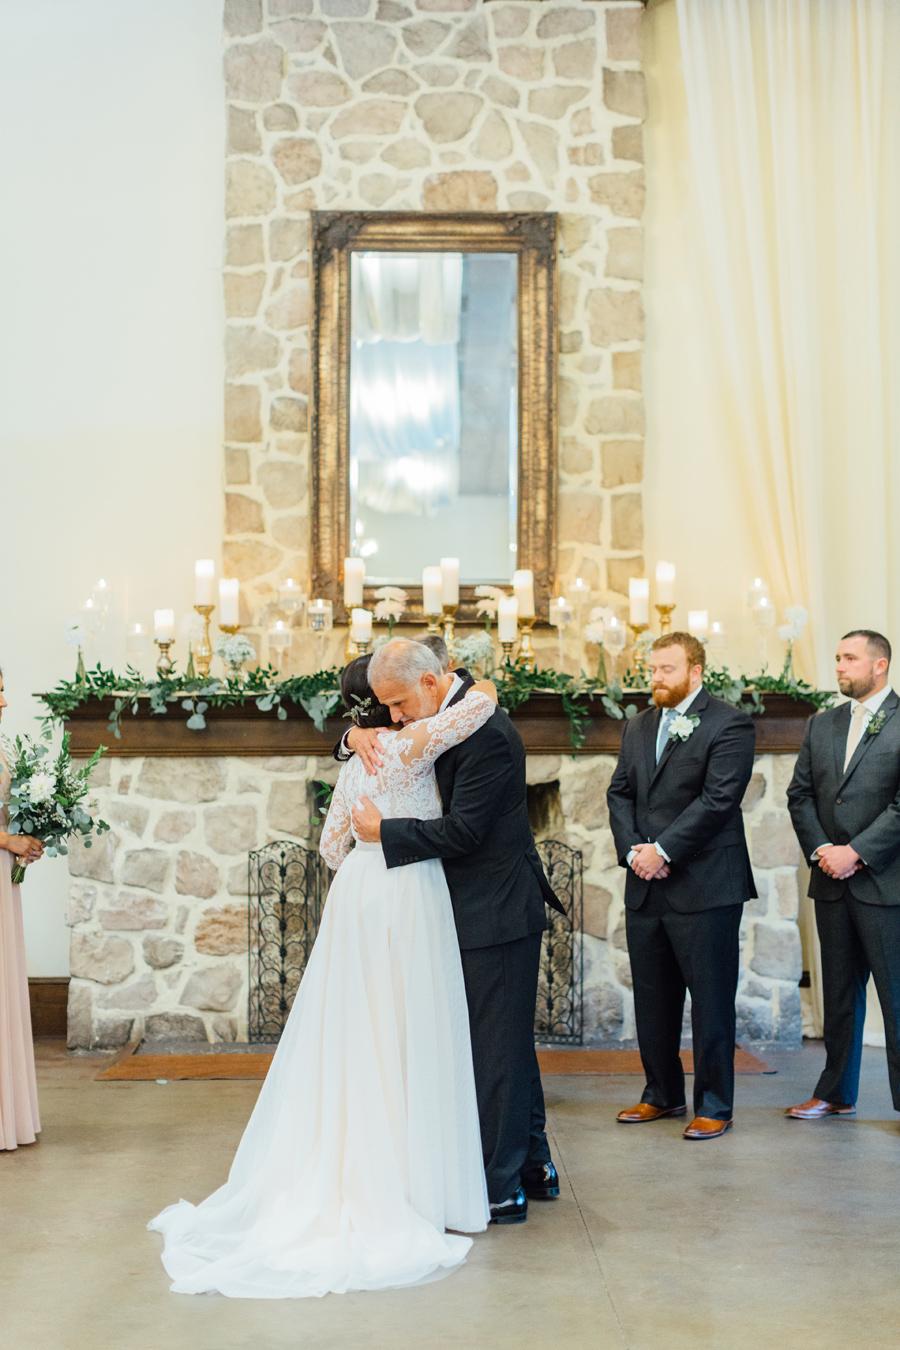 the-inn-at-leola-wedding-lancaster-pennsylvania-wedding-photographer-rebeka-viola-photograhy (56).jpg